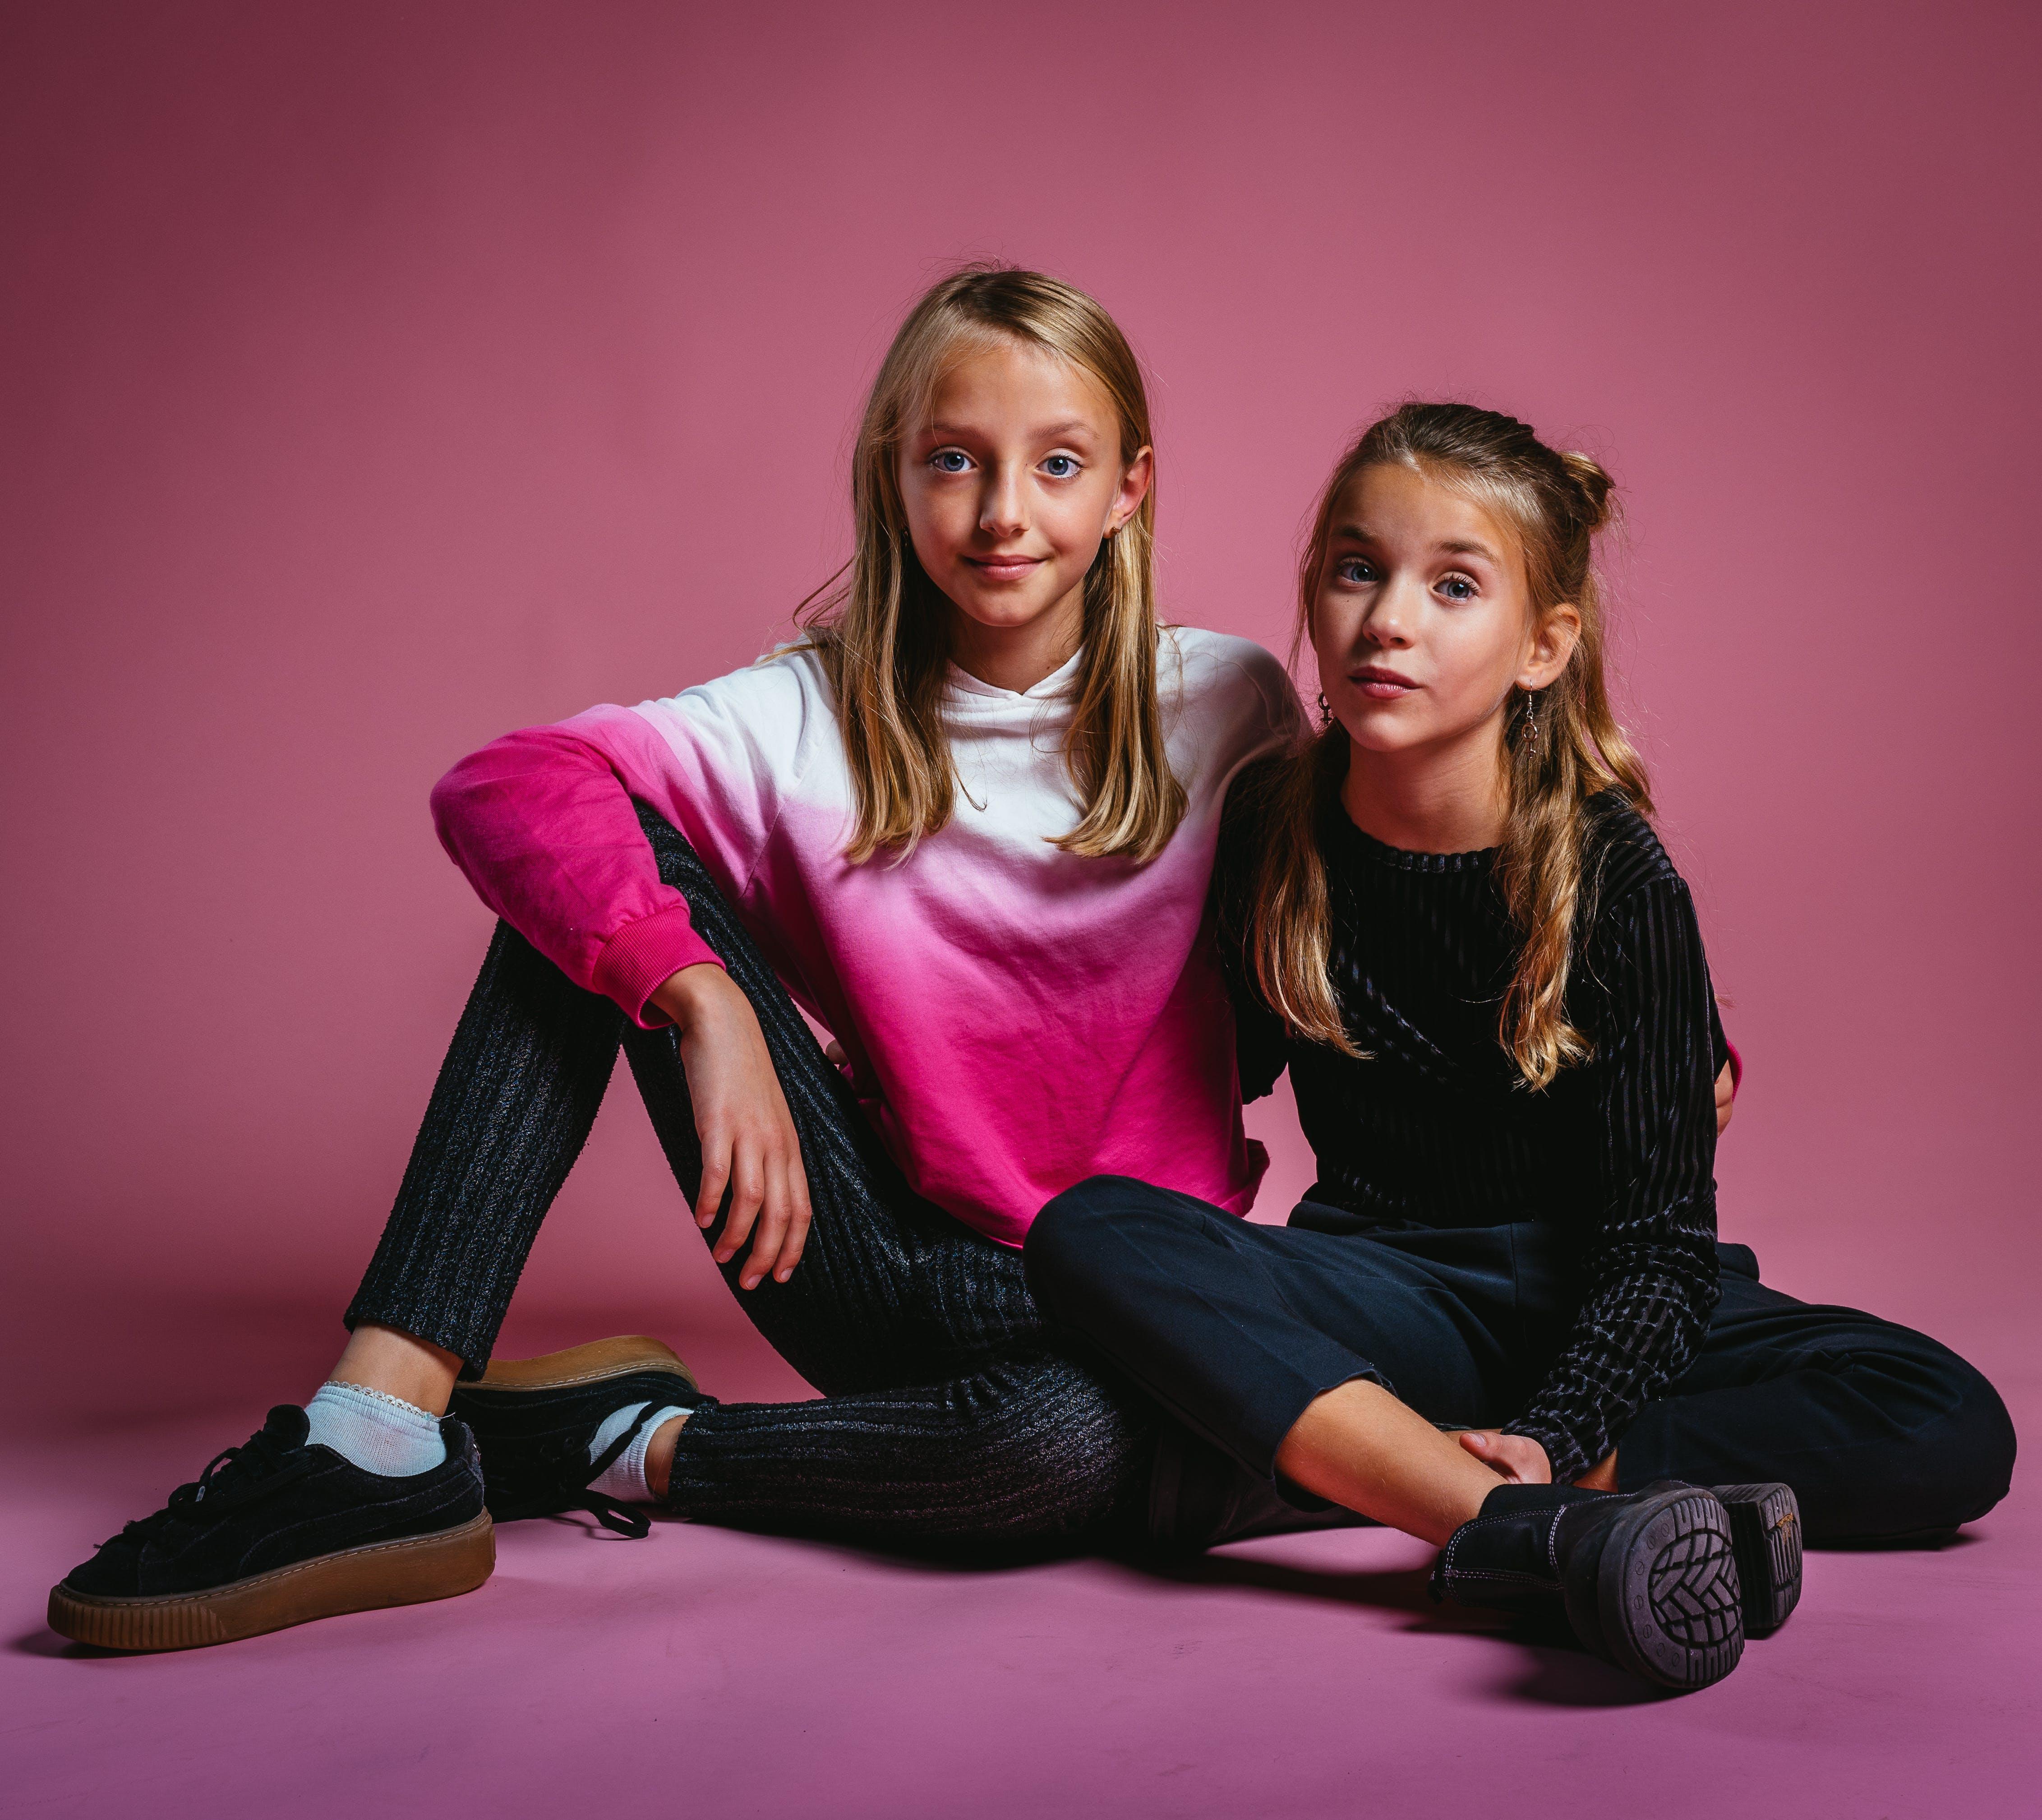 Two Girls Sitting on Floor